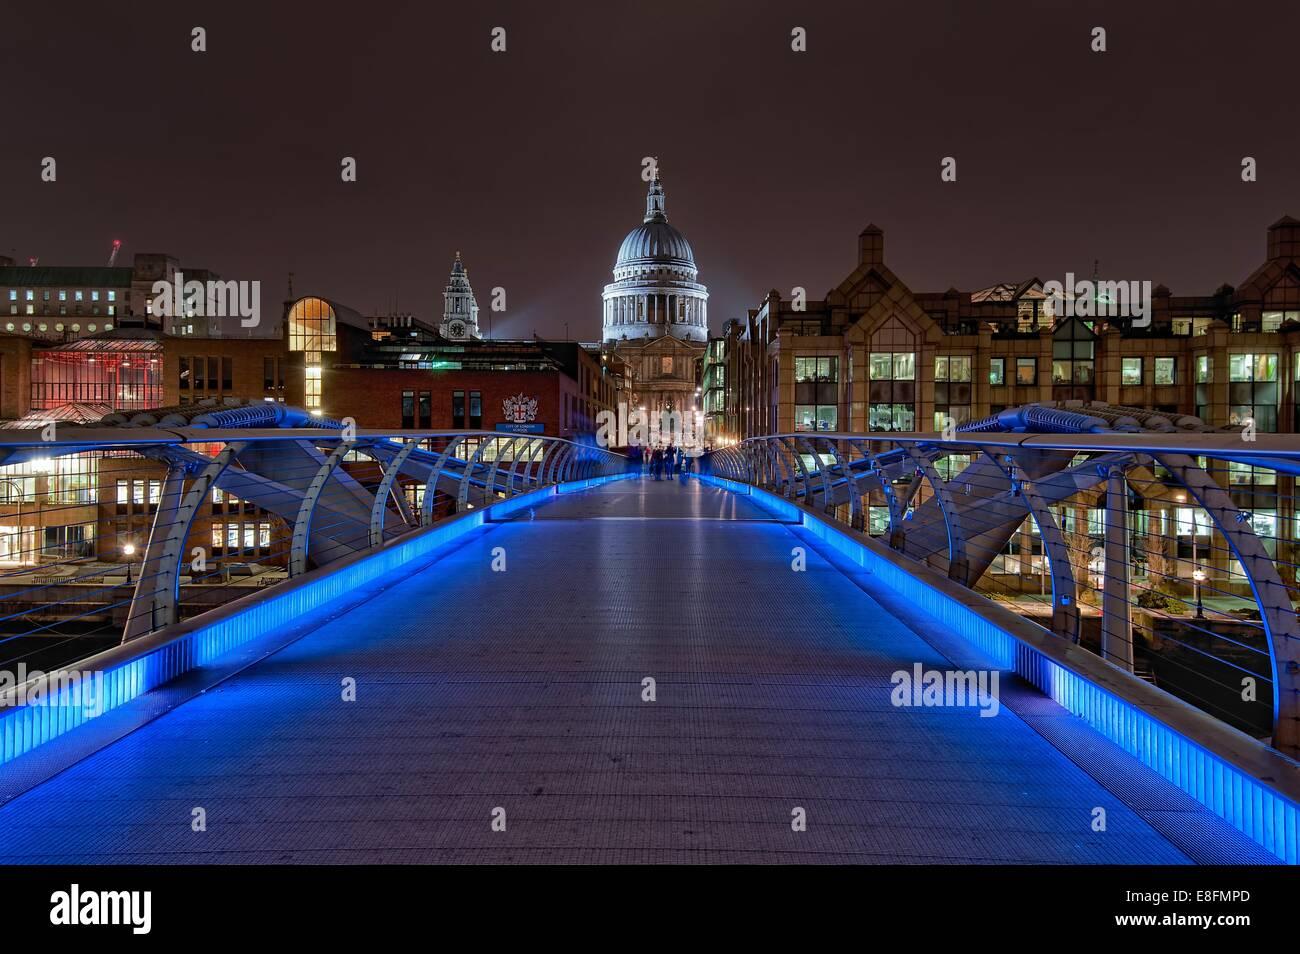 United Kingdom, London, View of Millennium Bridge - Stock Image